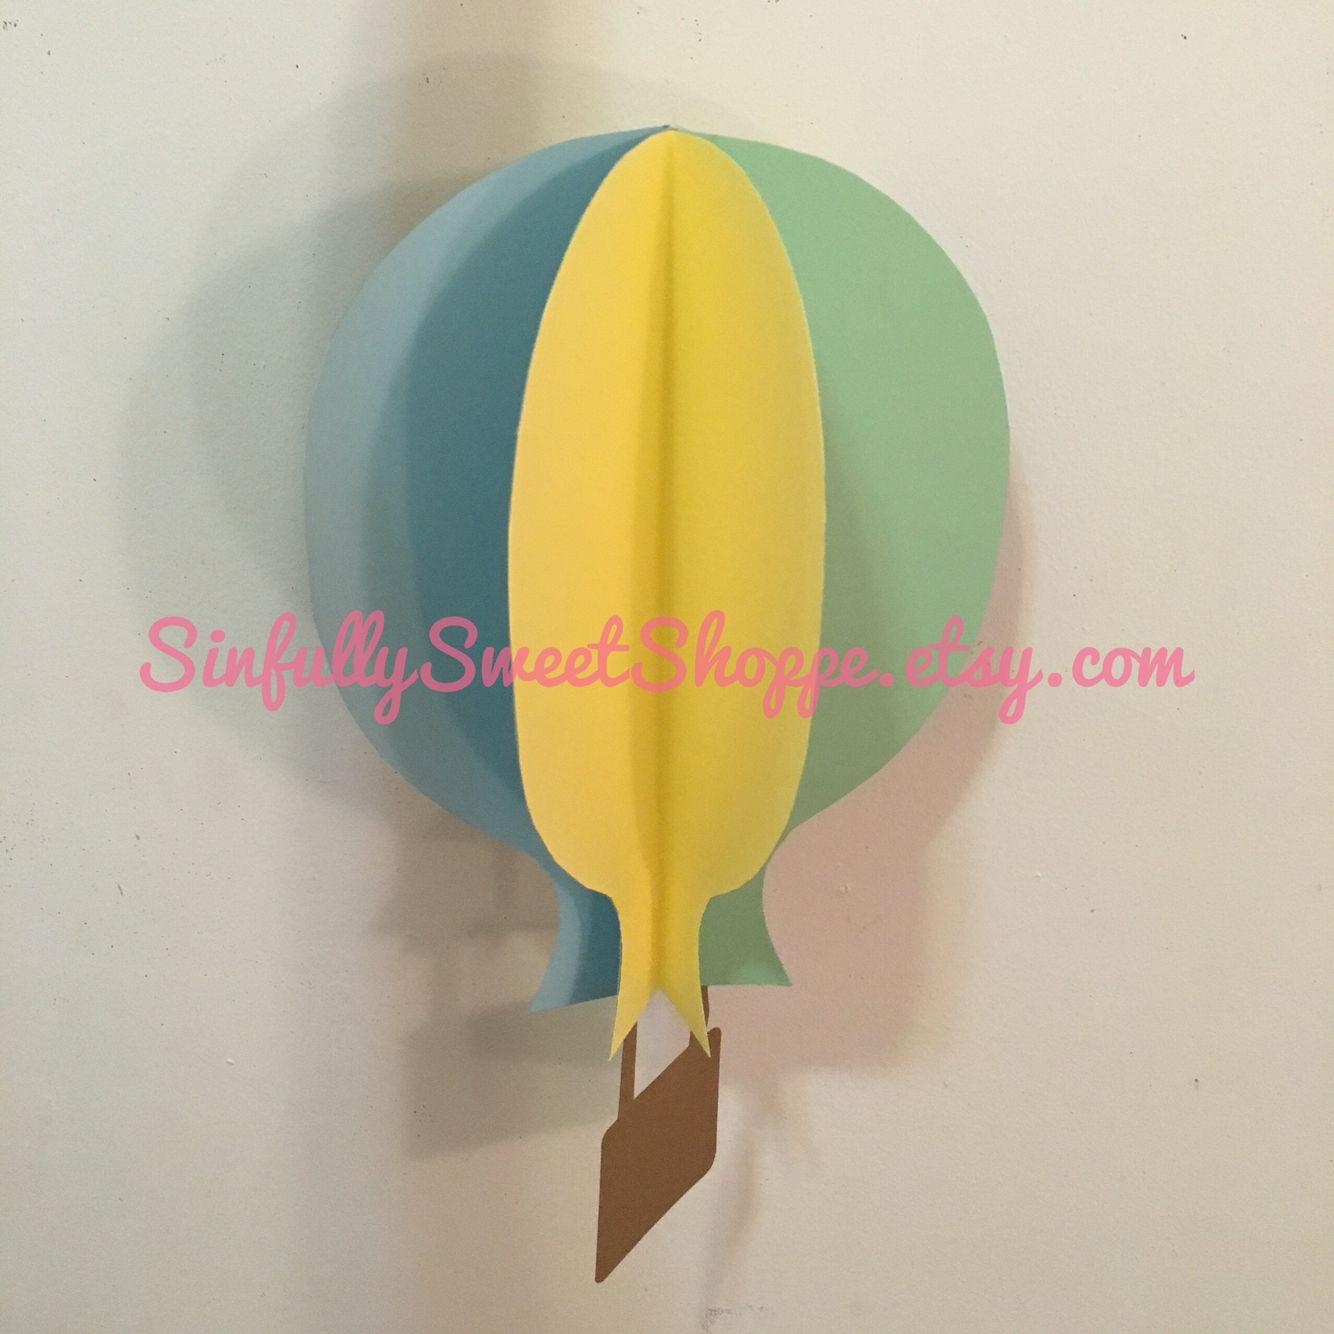 Fine Hot Air Balloon Wall Decor Photos - The Wall Art Decorations ...